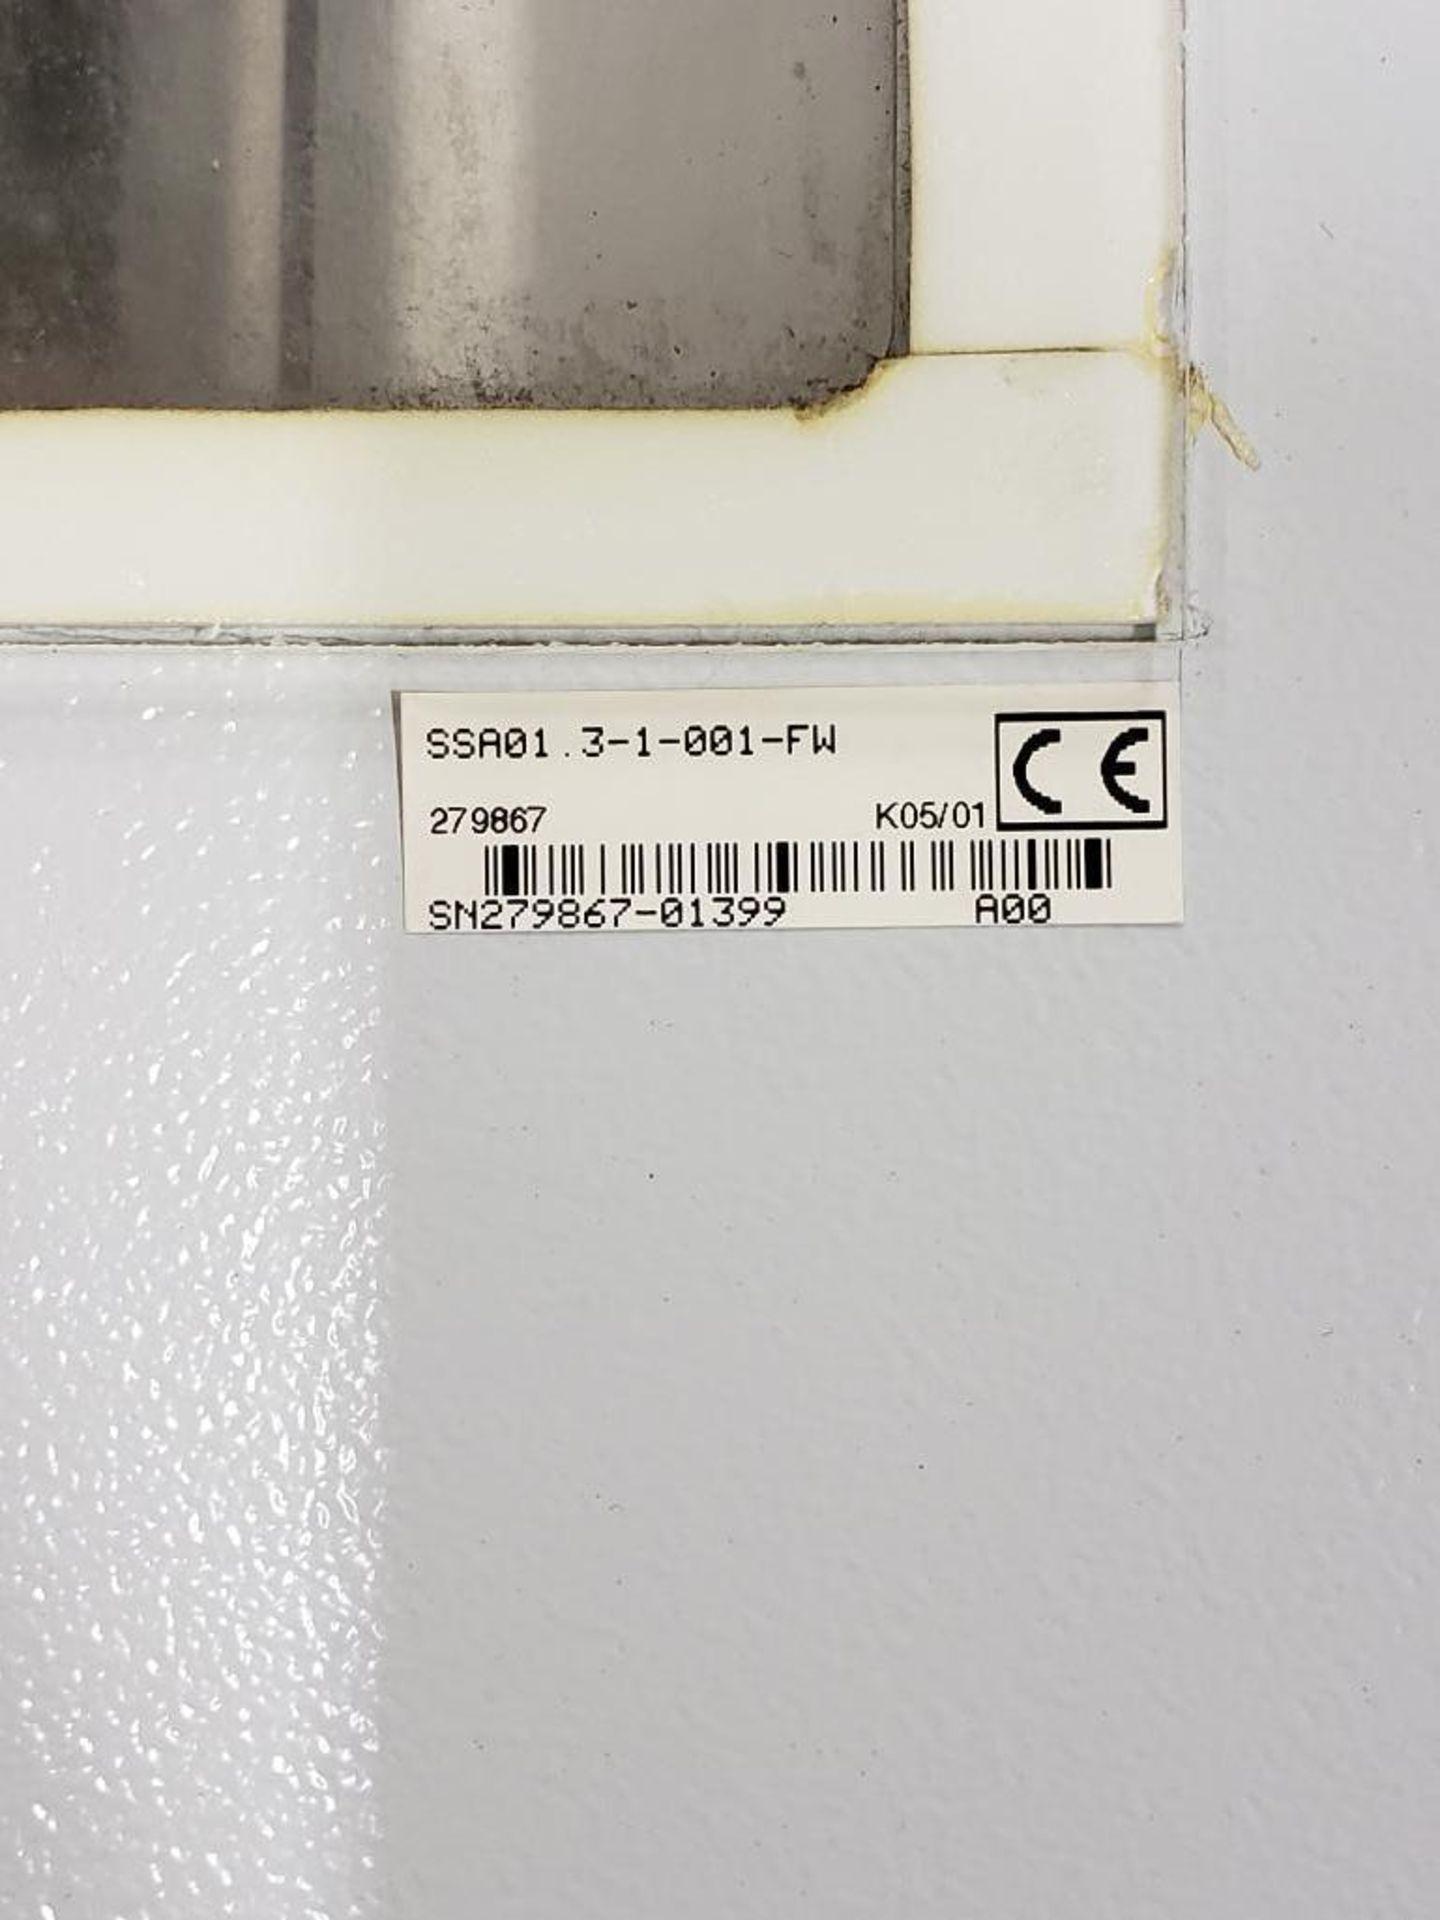 Lot 15 - Rexroth Indramat ECO drive model SSA01.3-1-001-FW.